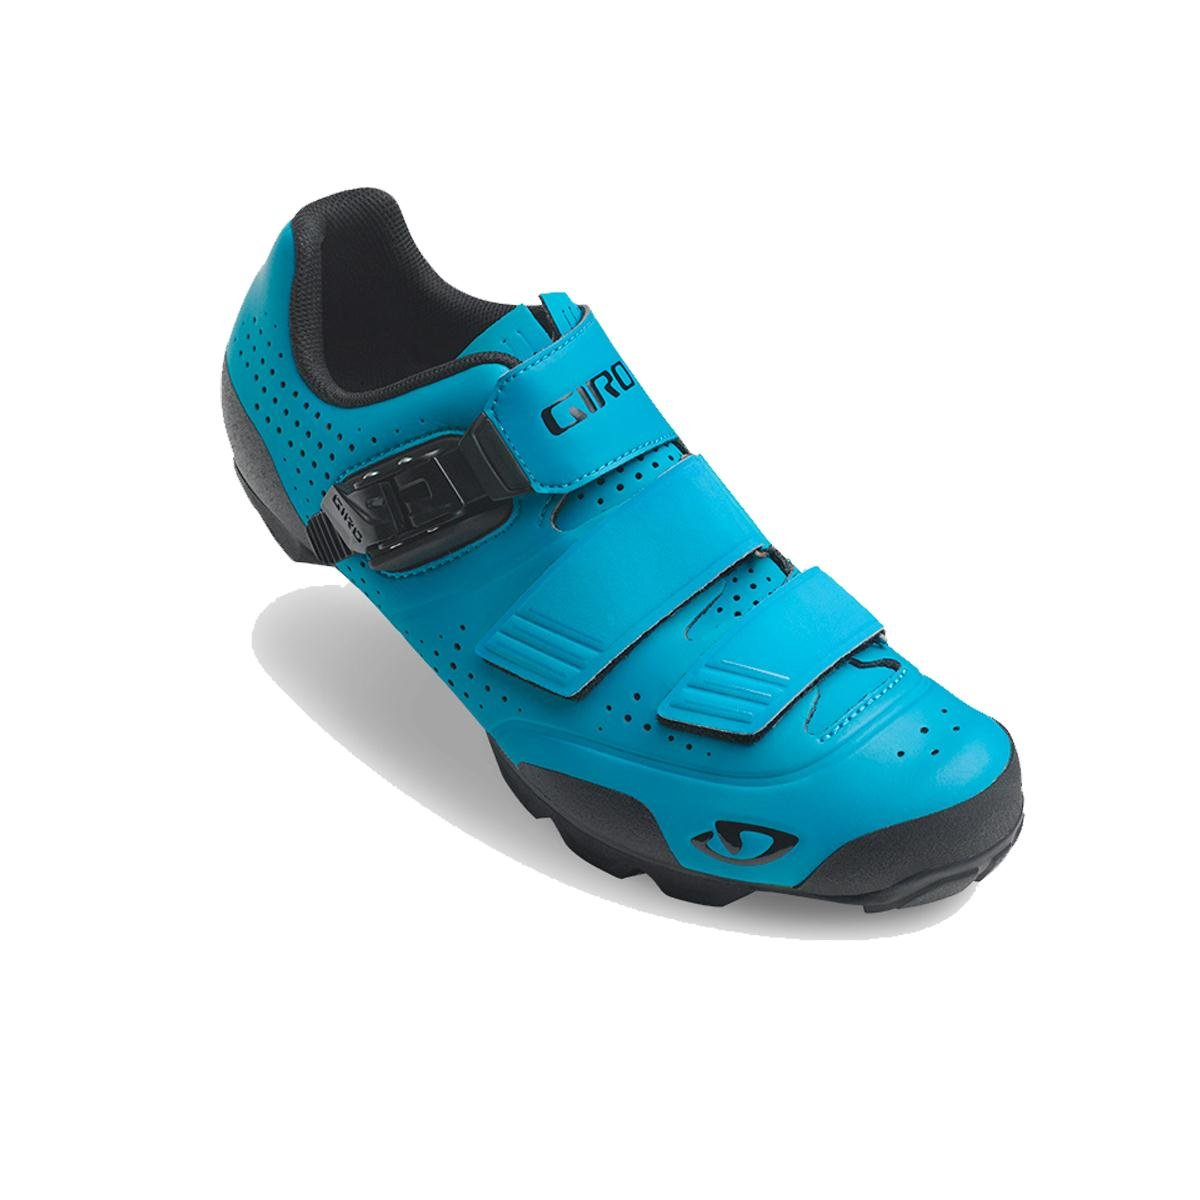 Giro Men's Privateer R B01LY4ZBPW 40 M EU Blue Jewel